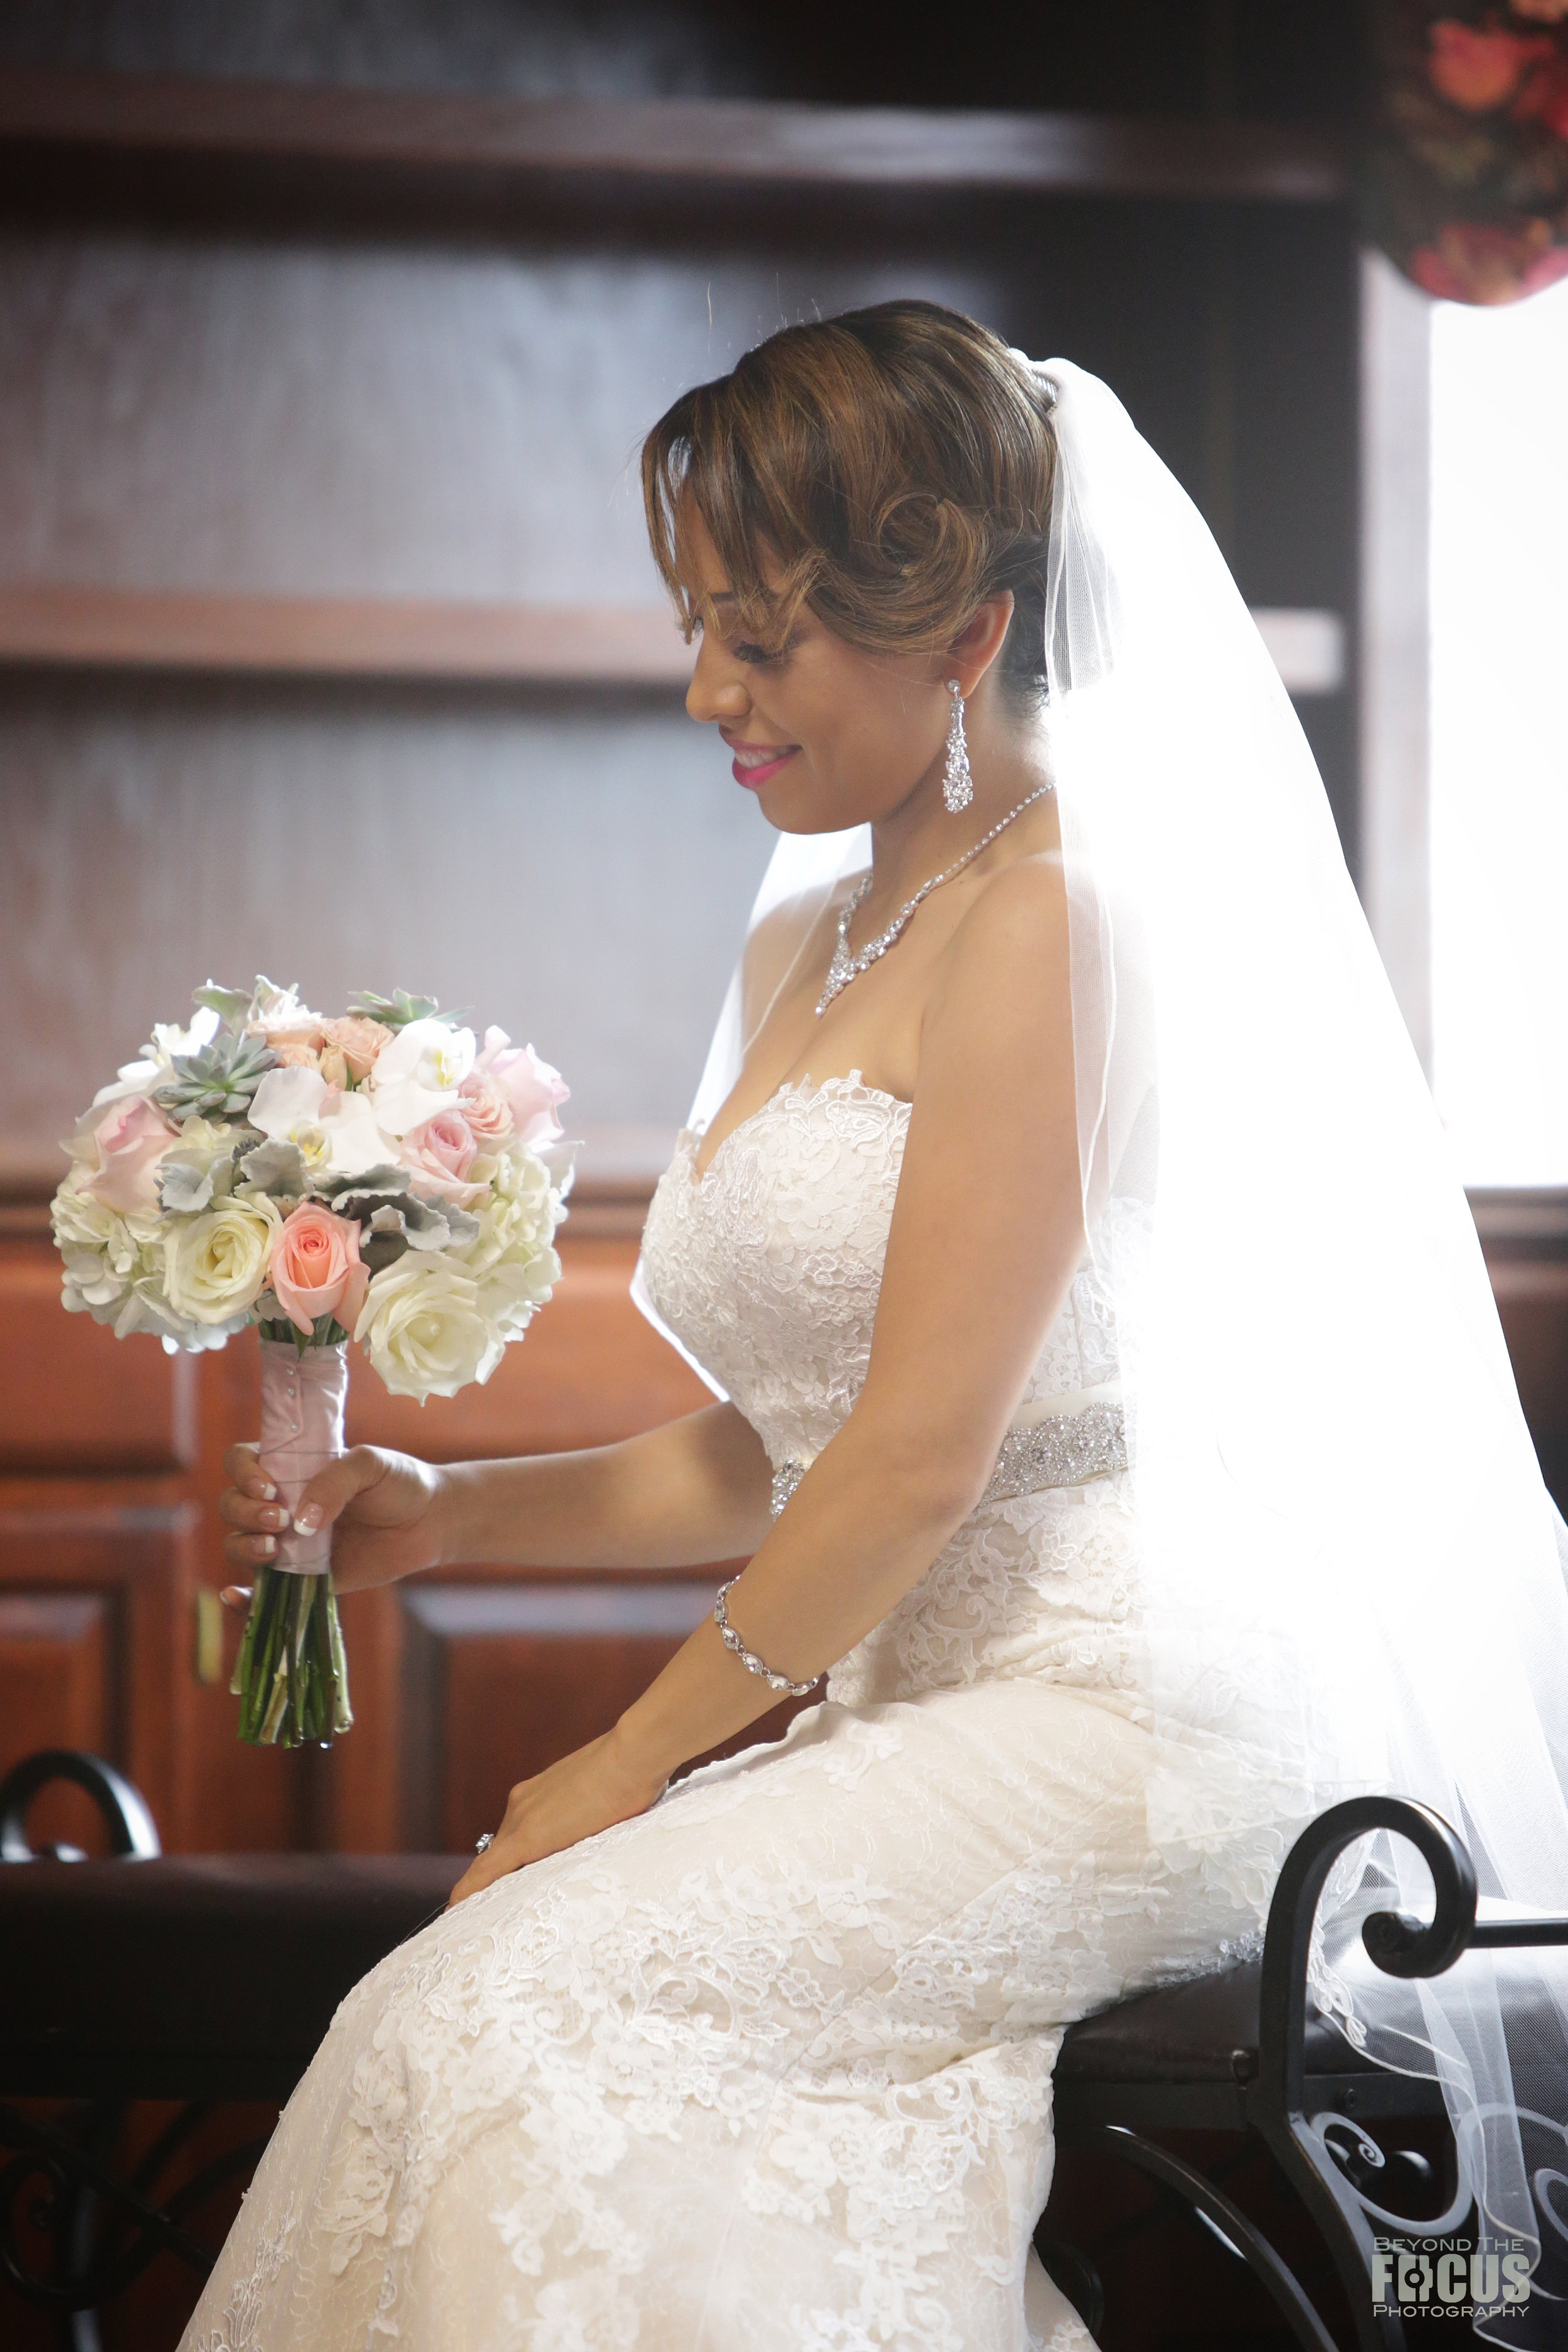 Palmer Wedding - Pre-Wedding Photos 2.jpg